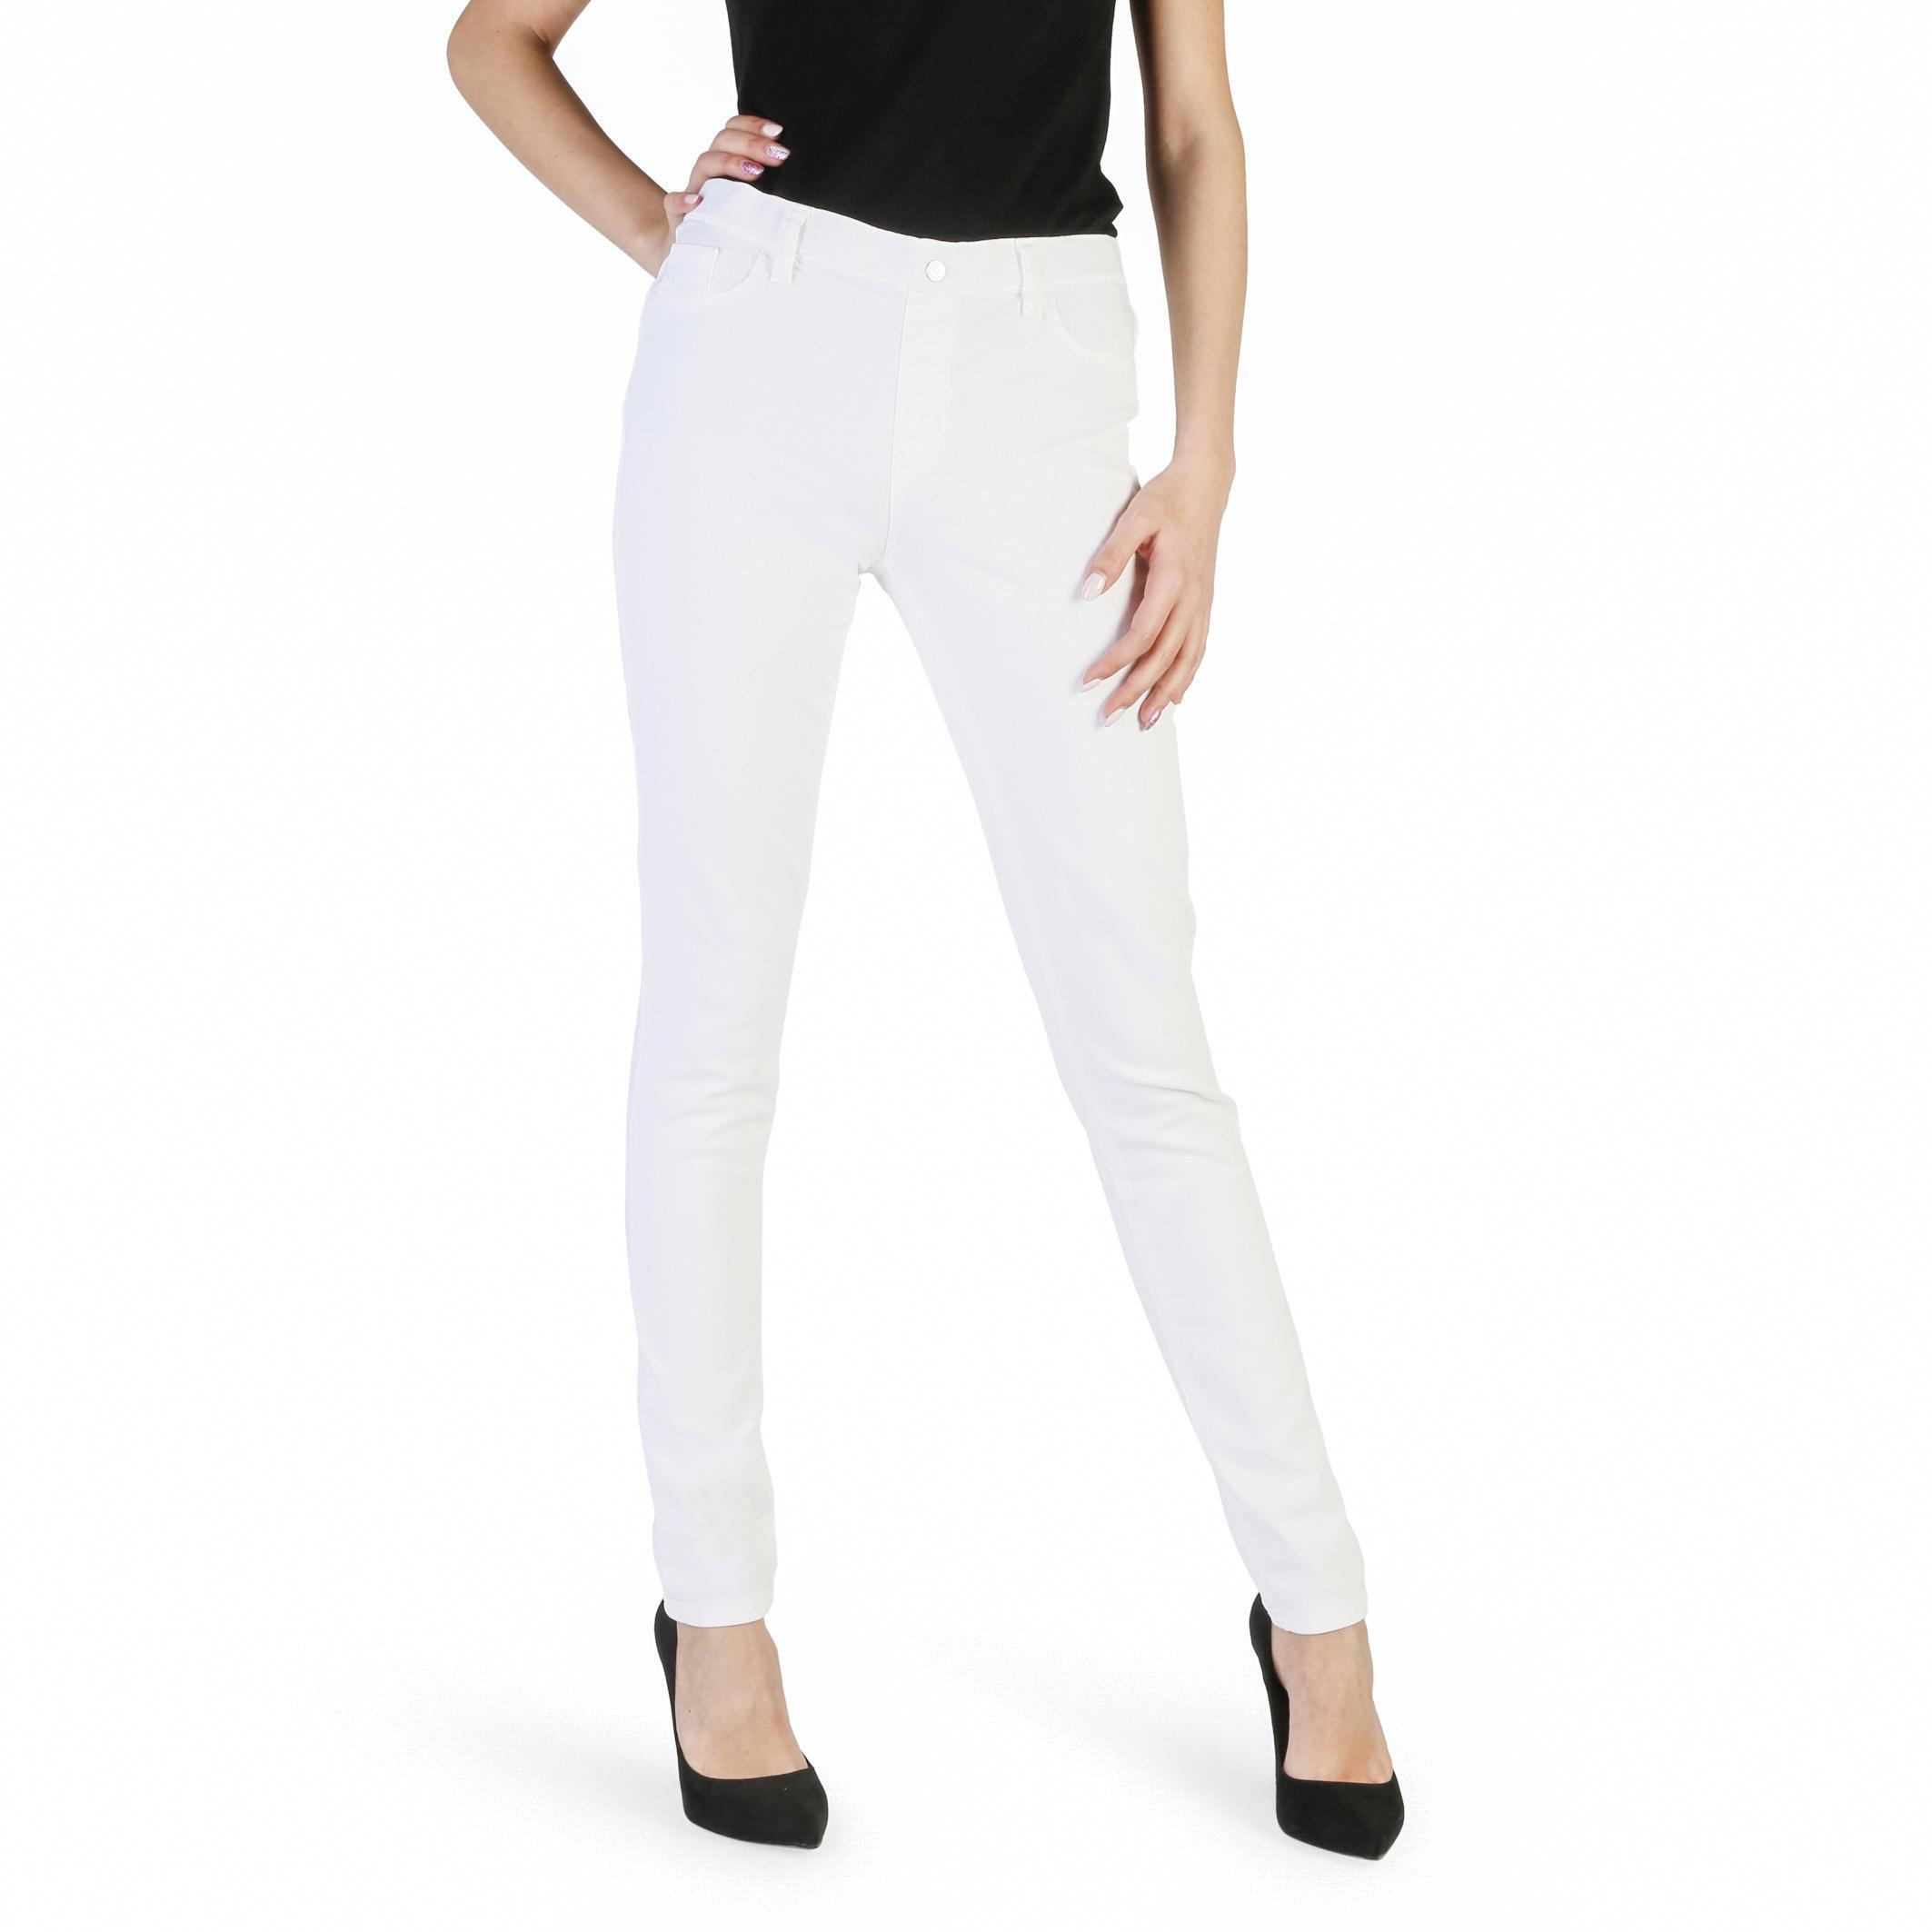 Carrera Jeans 00767L_922SS Femme white 89194 denim jeans